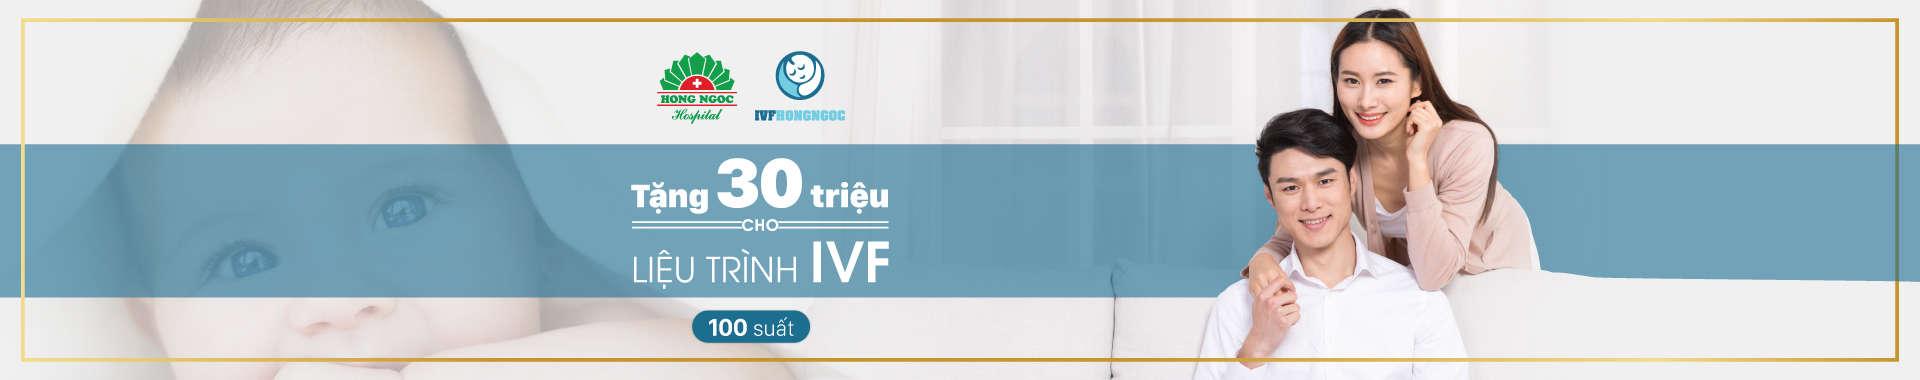 IVF_T112019_1920x380